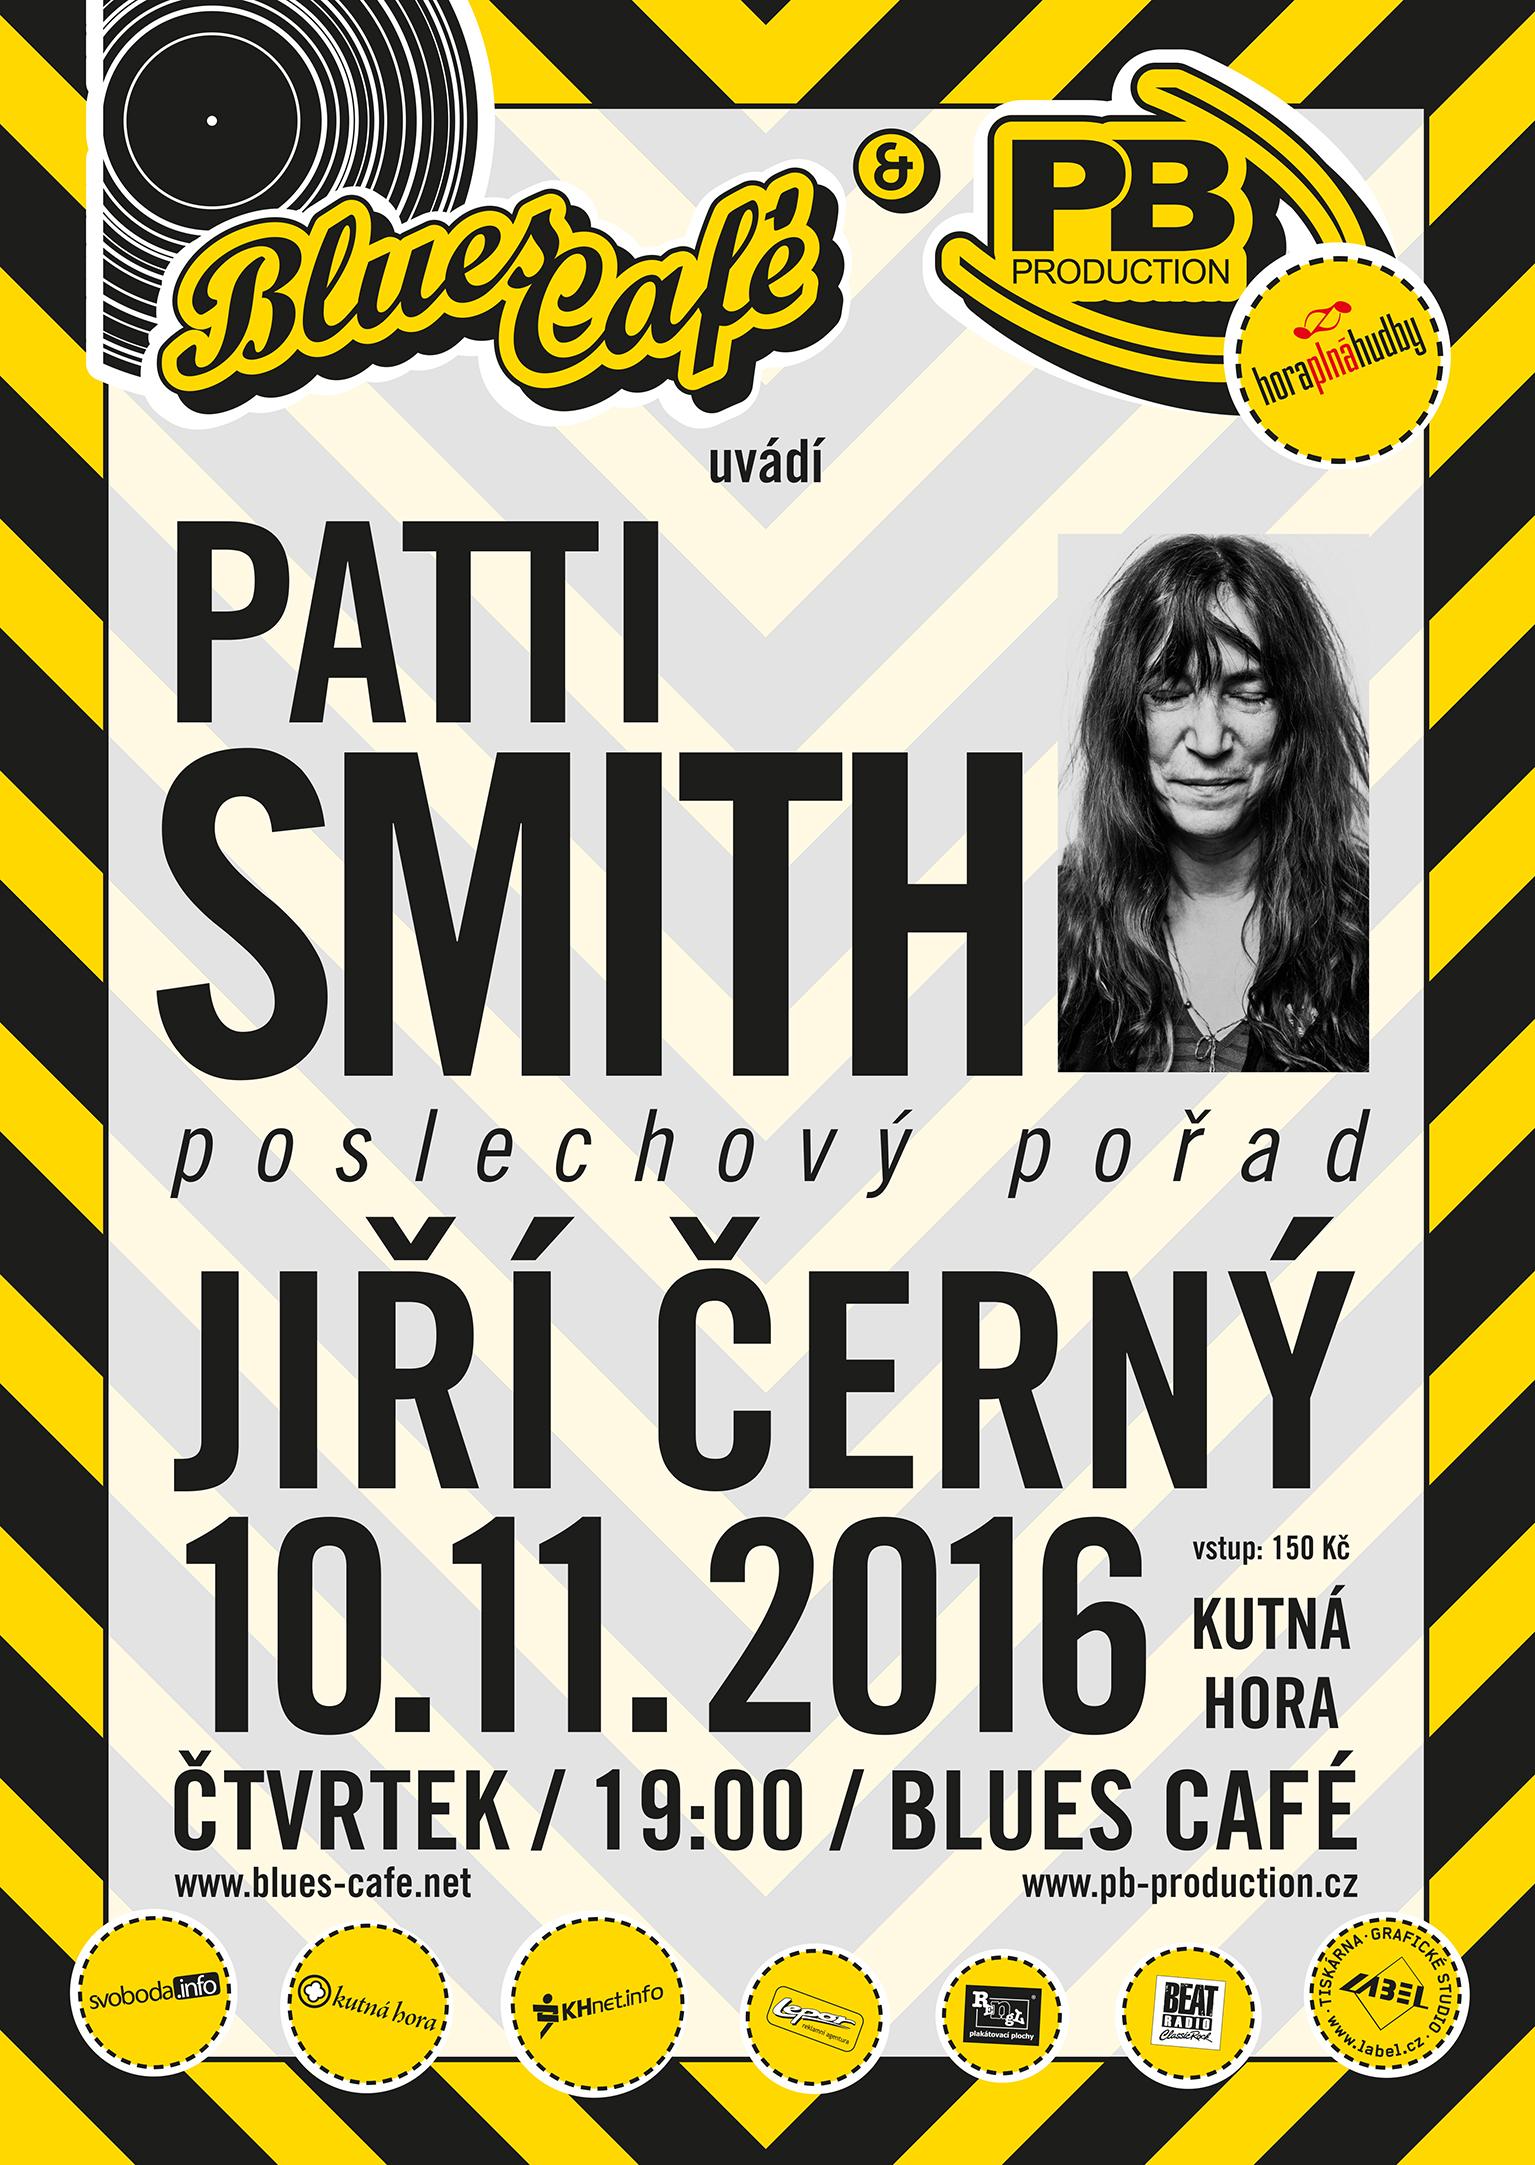 1076-jiri-cerny-smith-blues-cafe.jpg